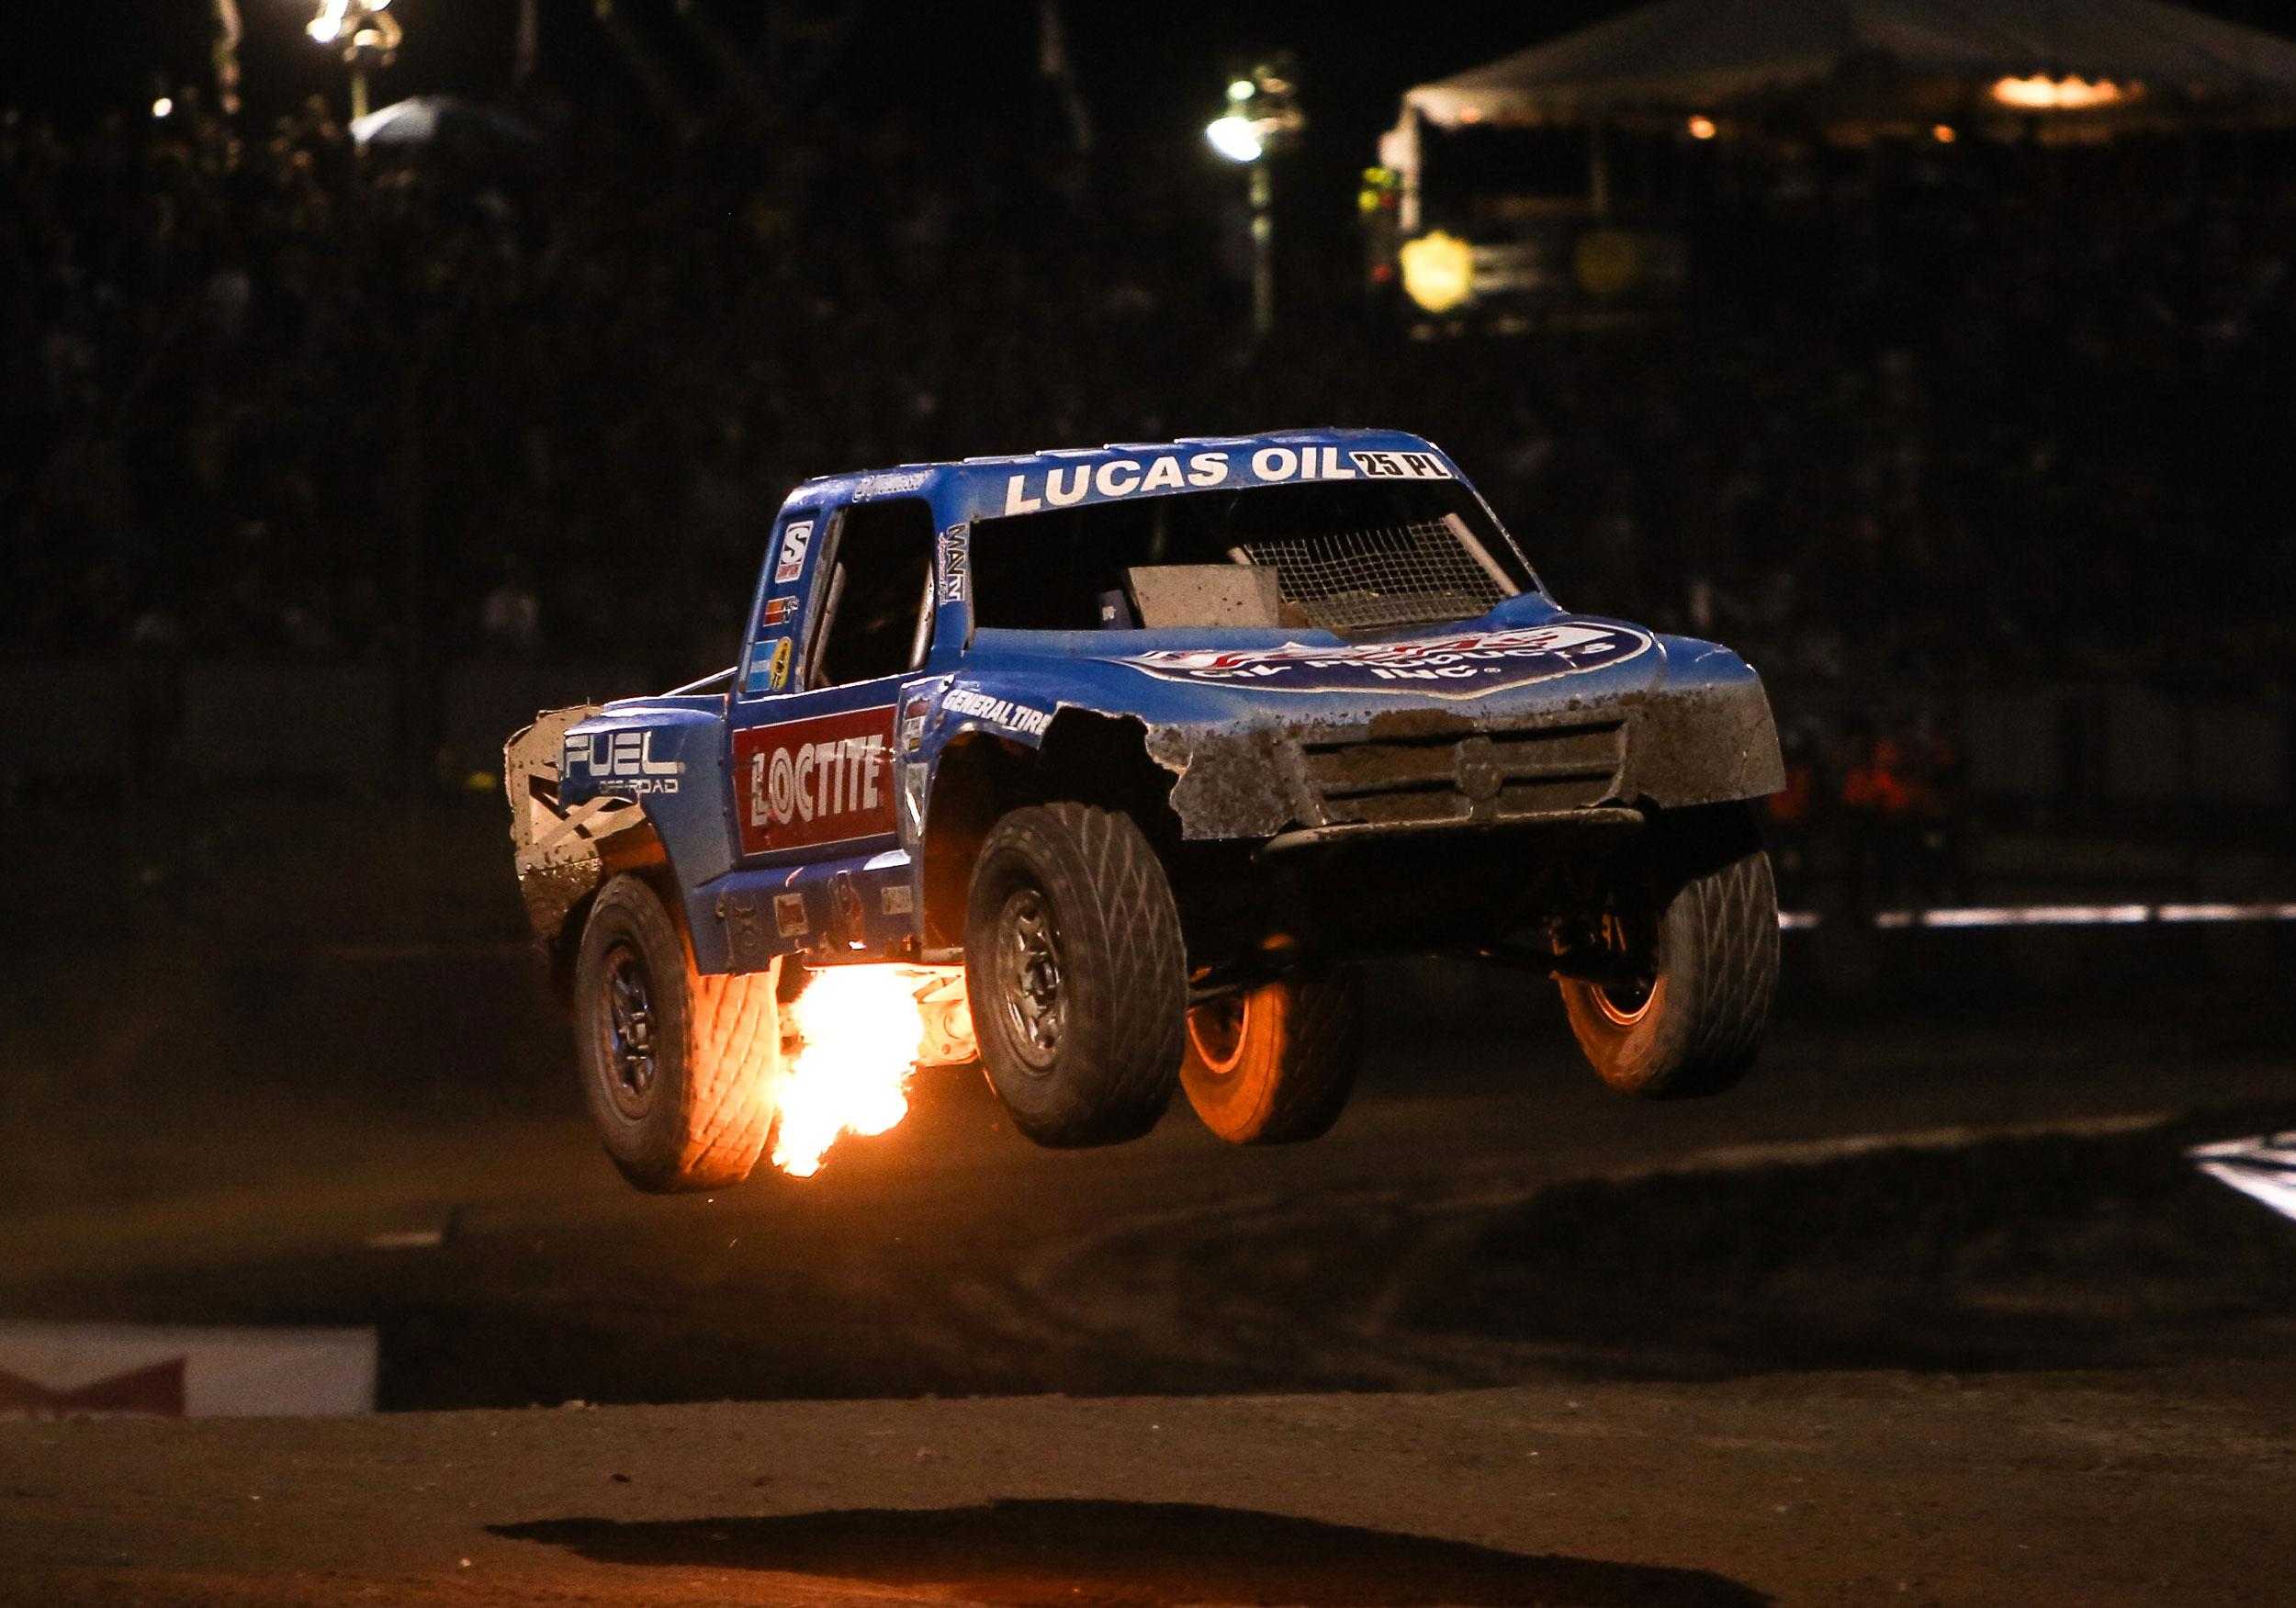 Motor-Loctite-Flames-7467.jpg